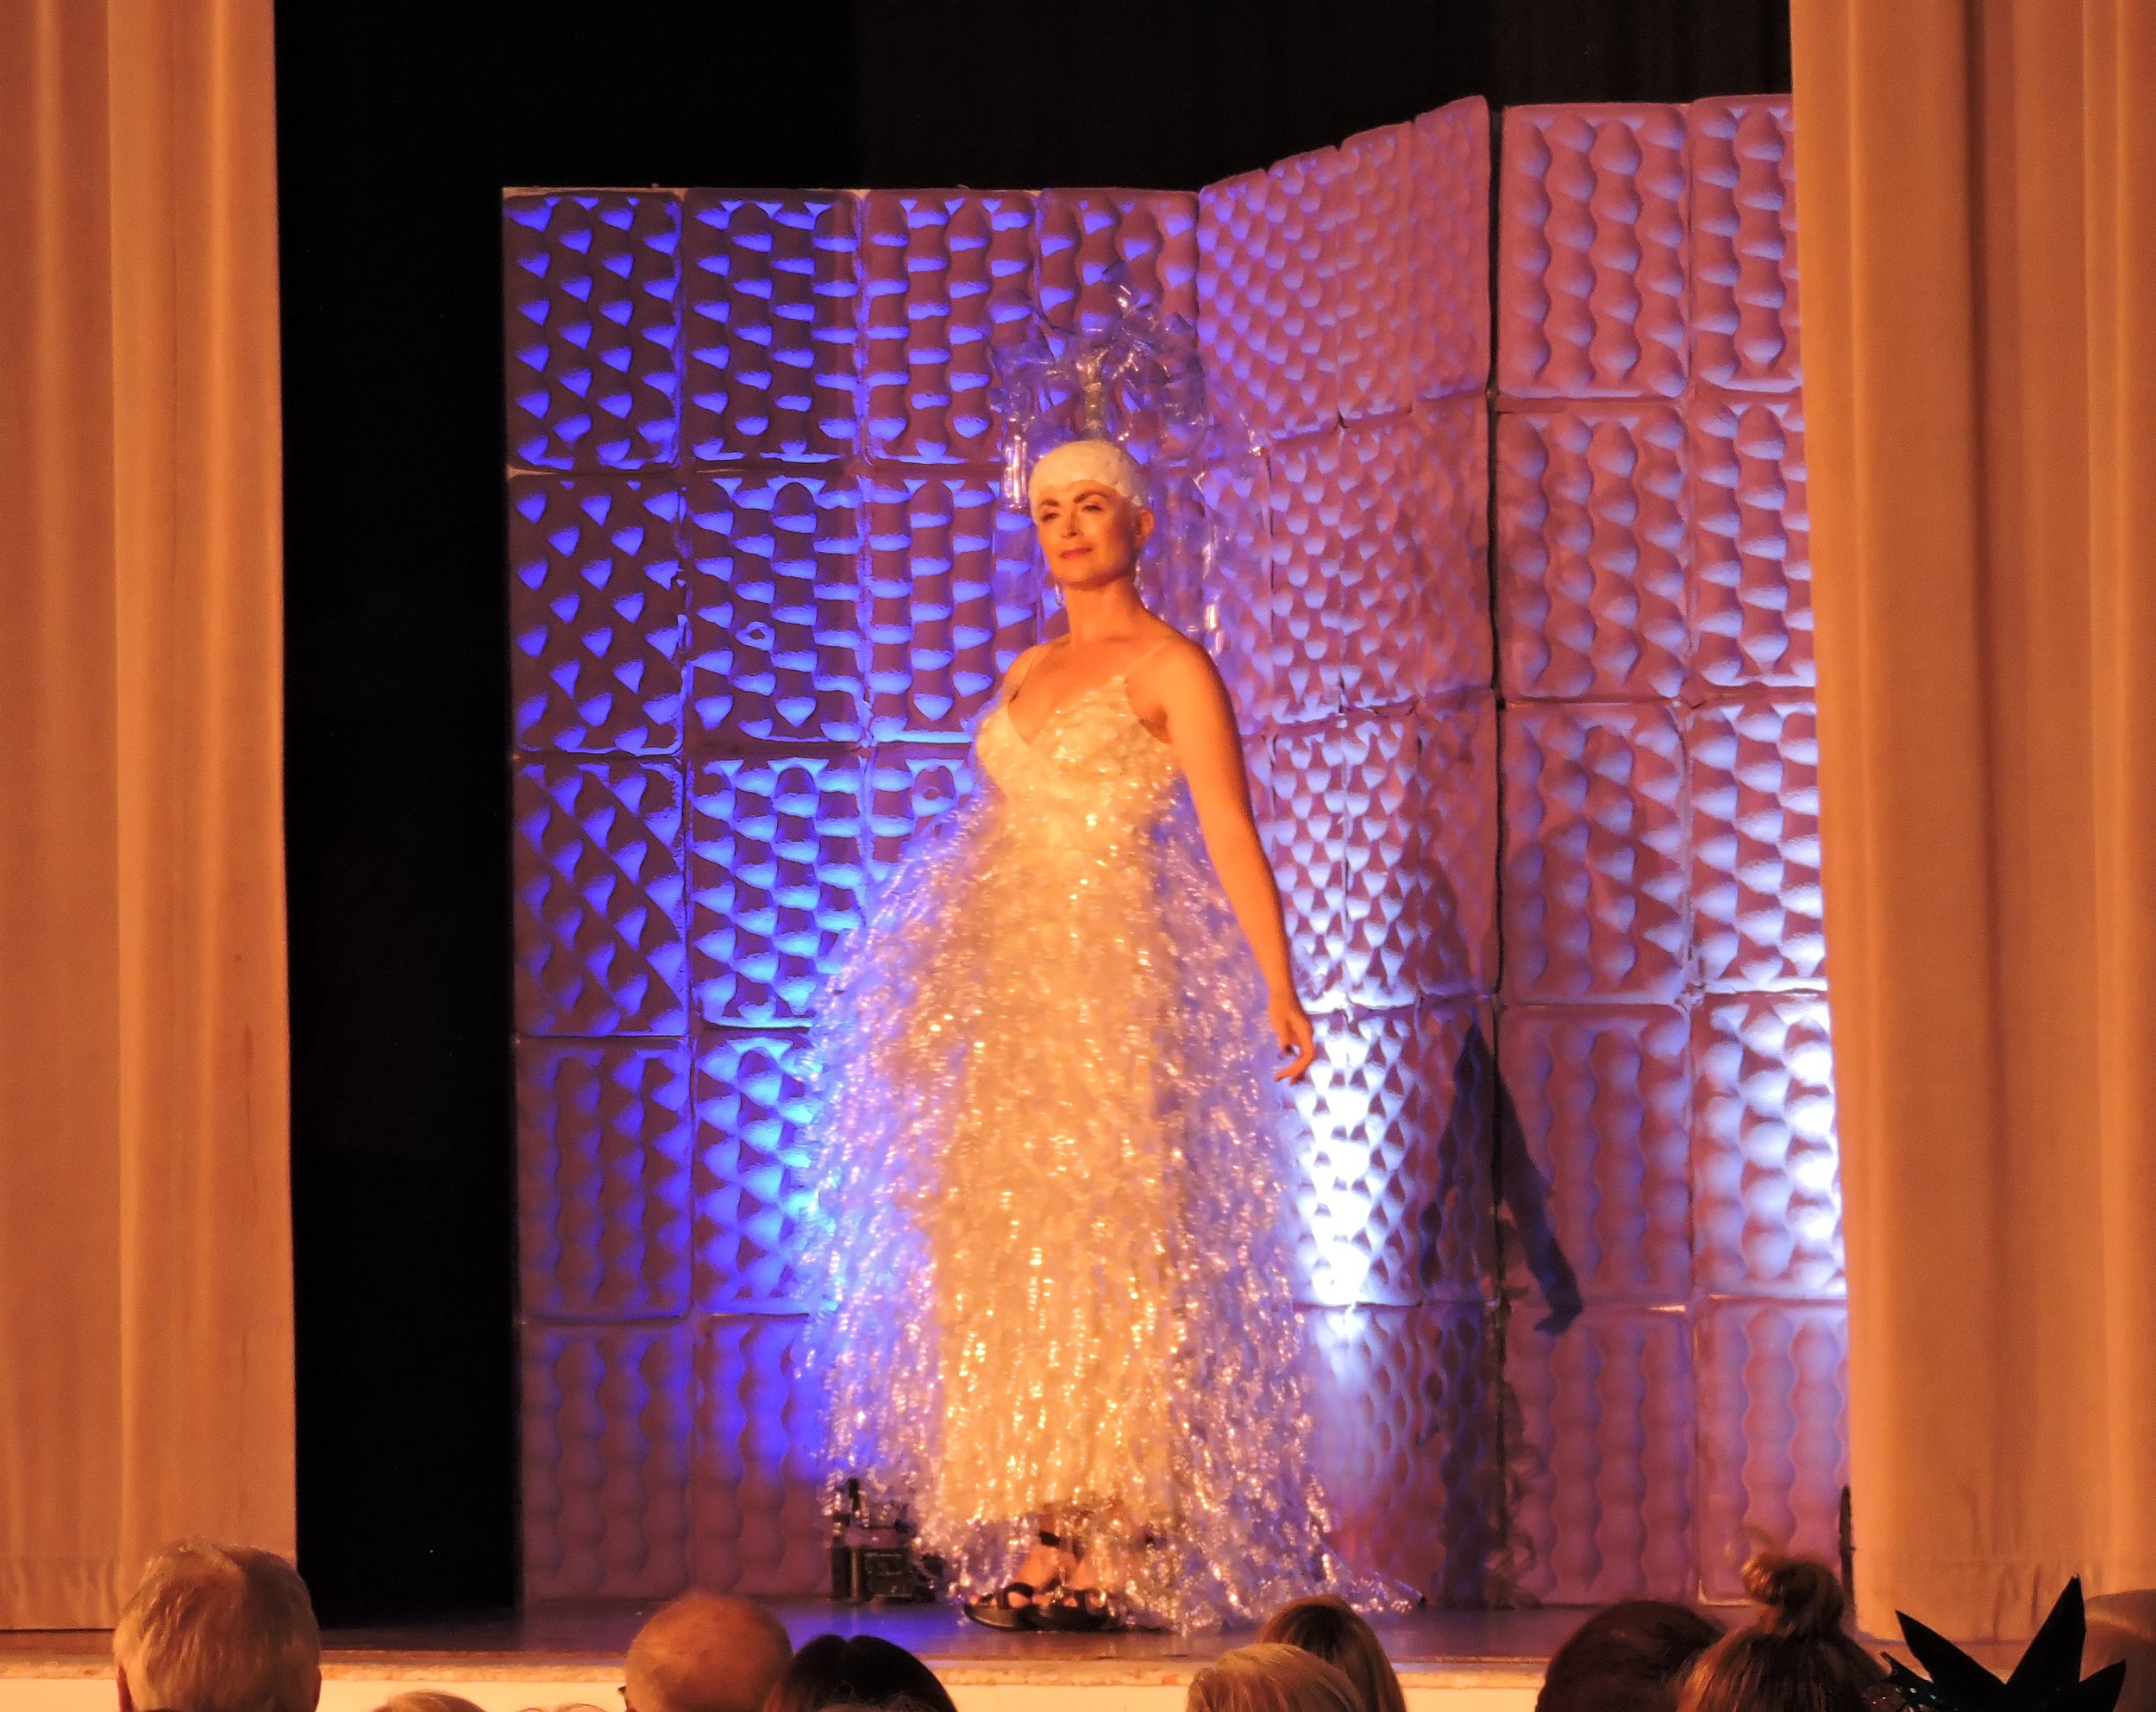 Geyser Gown at Sonoma Community Center's Trashion Fashion April 2018